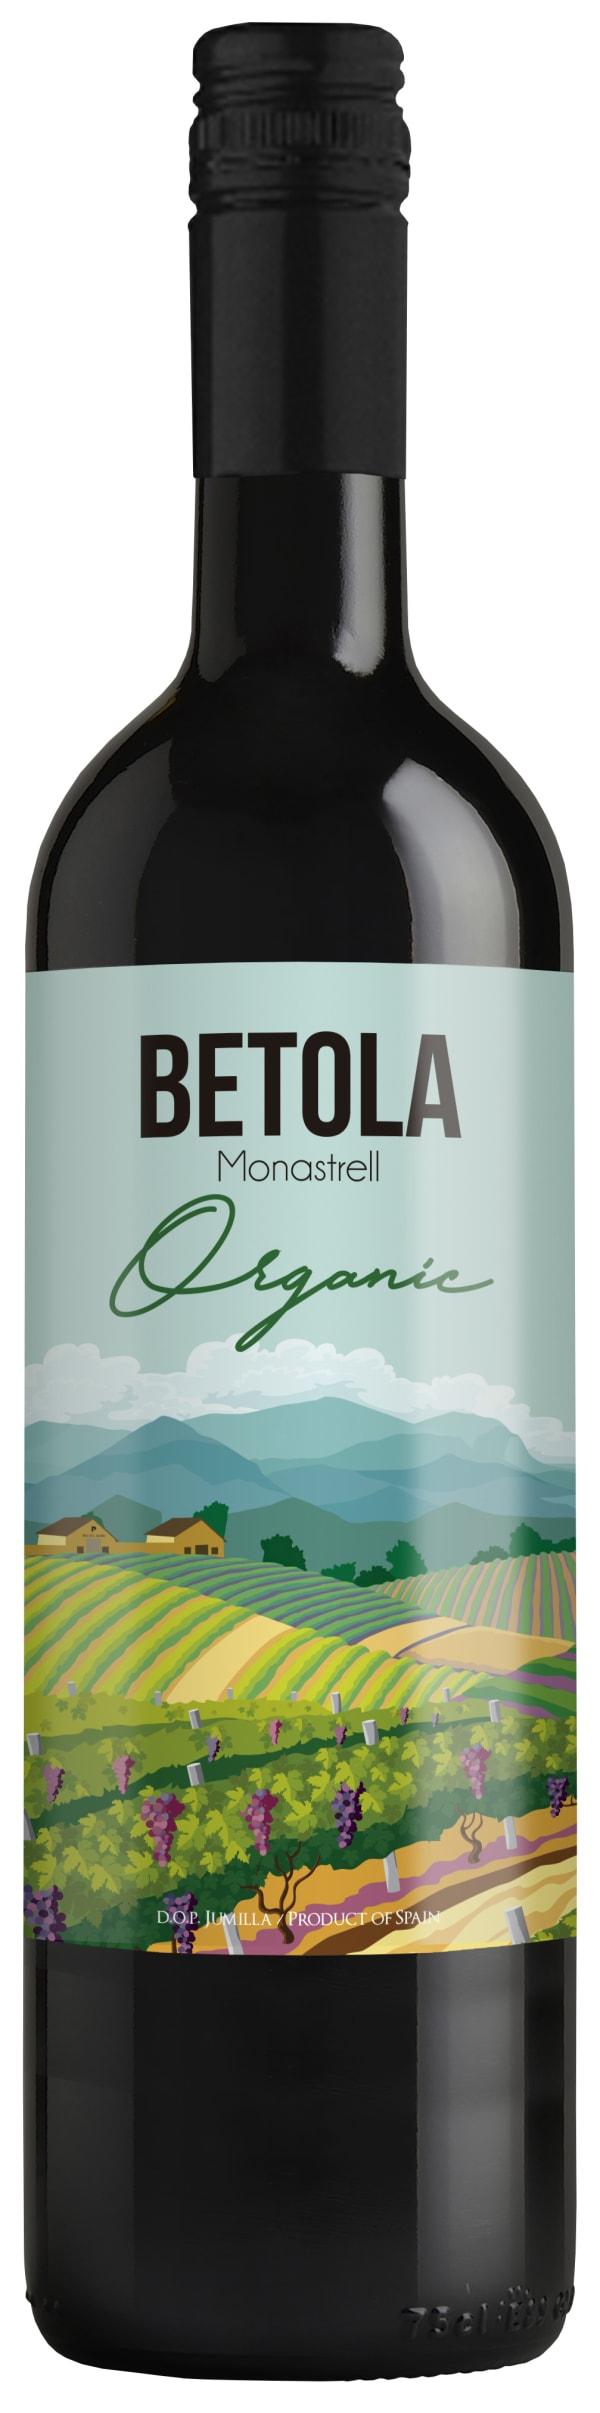 Betola Organic Monastrell 2016